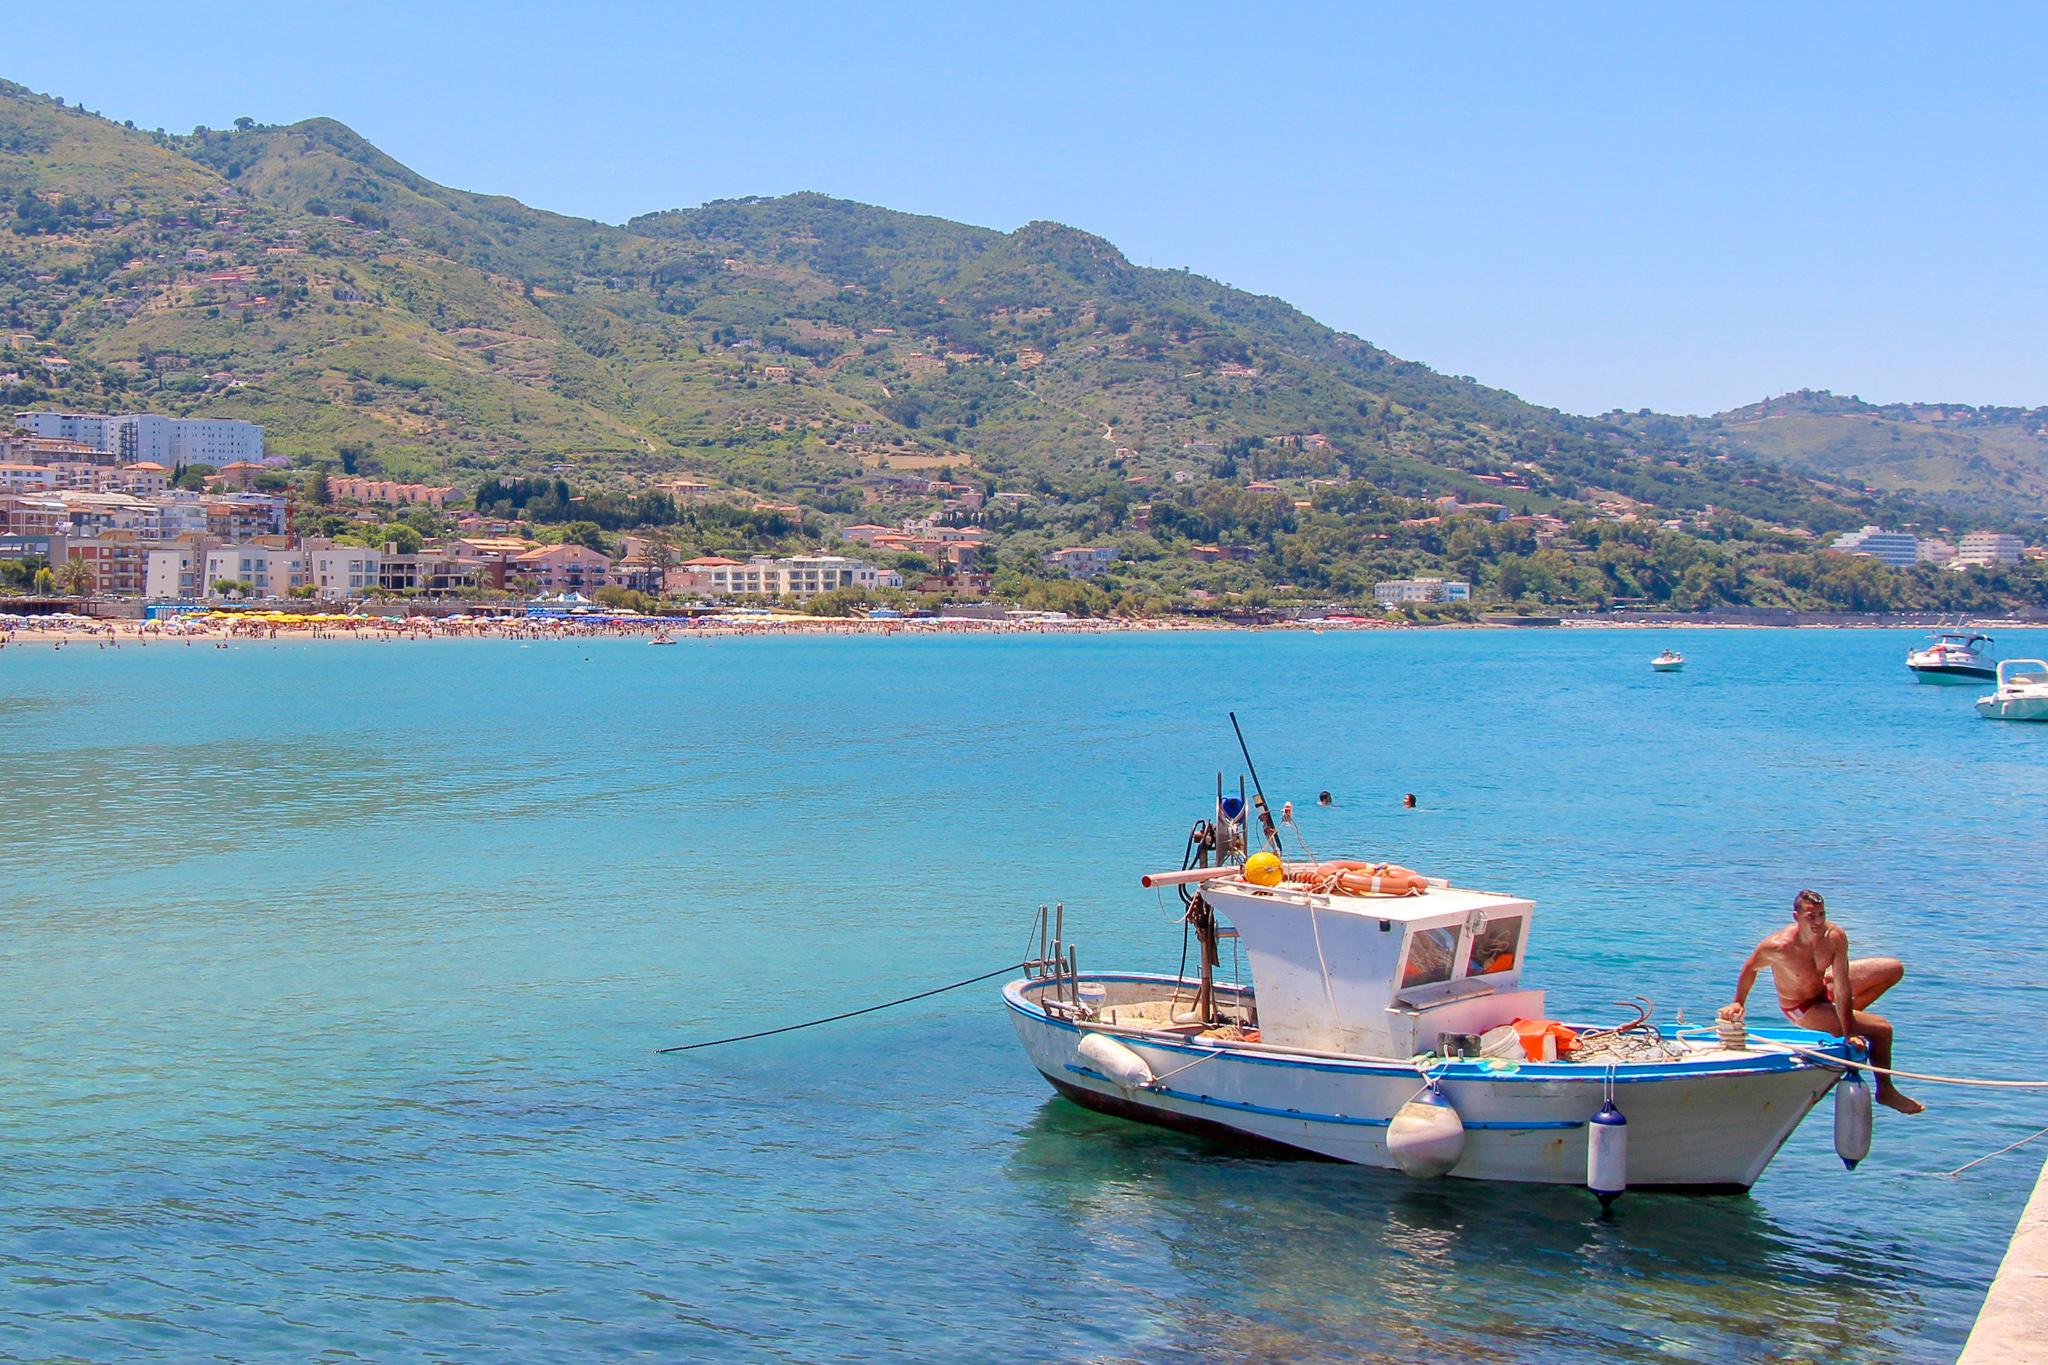 Cefalu Sicily Scenery Travel Italy